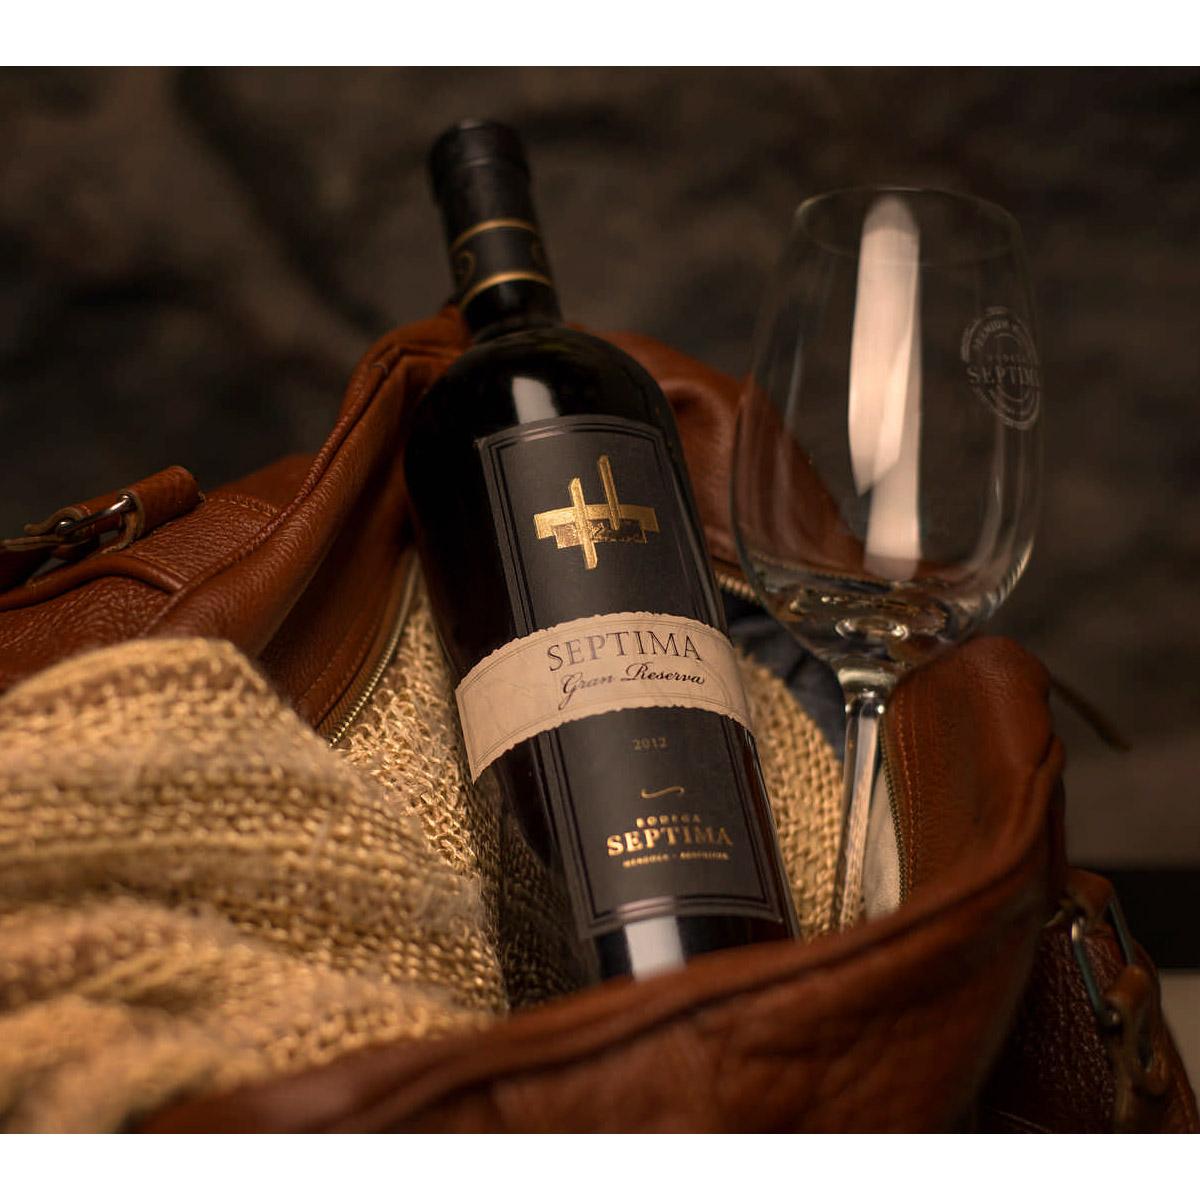 Vinho Septima Gran Reserva Blend 750ml